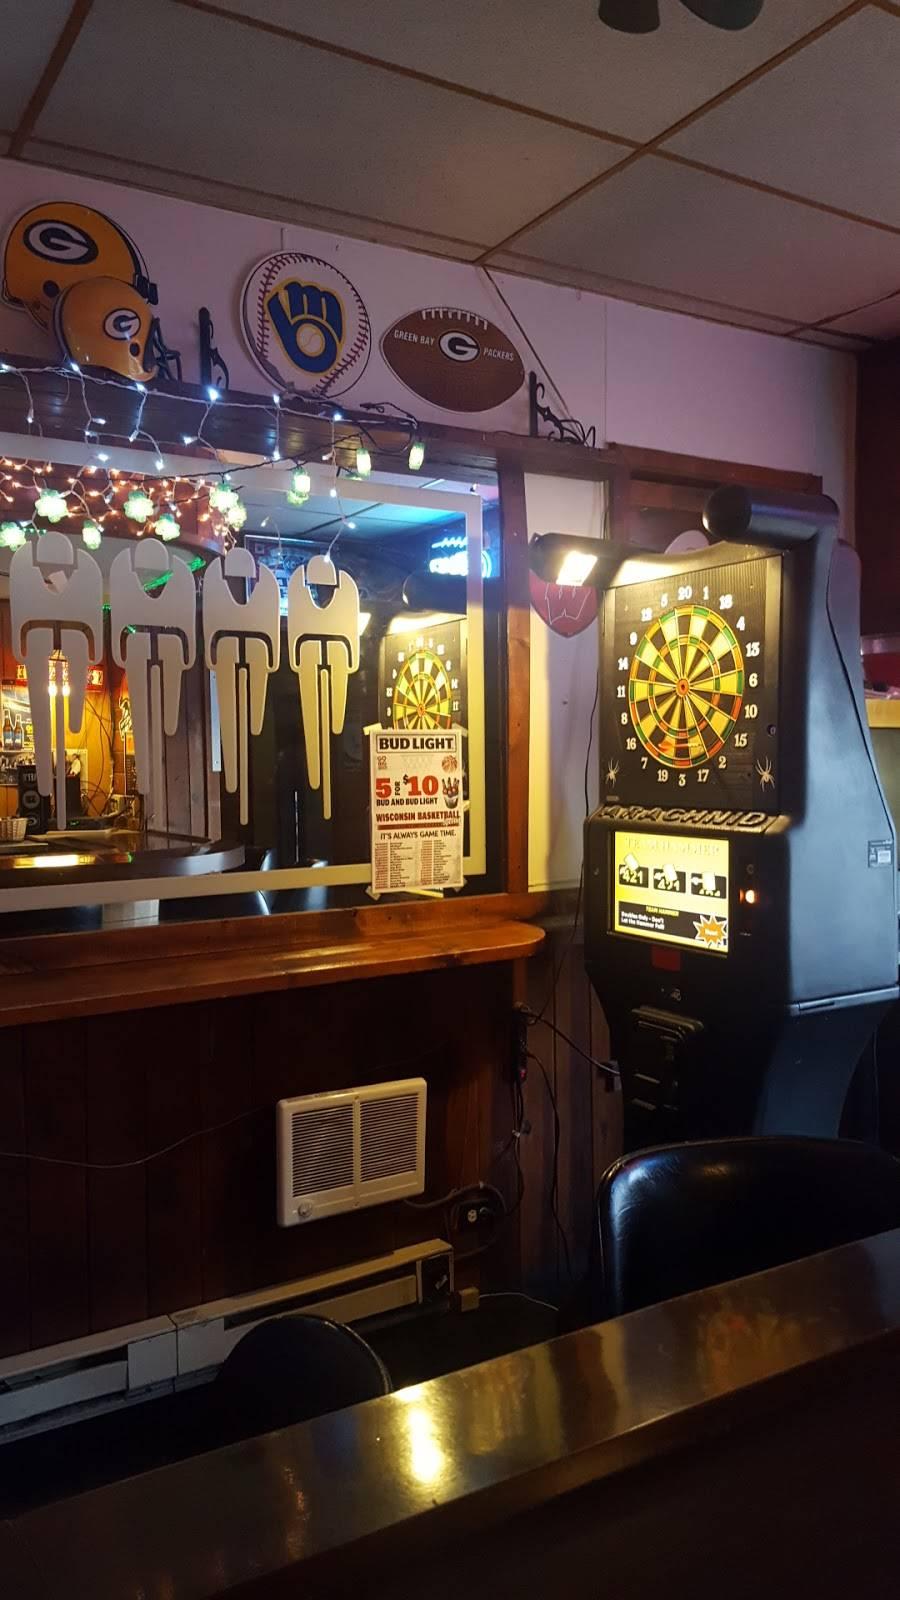 Gords Pub   restaurant   210 Main St, Neenah, WI 54956, USA   9207224575 OR +1 920-722-4575